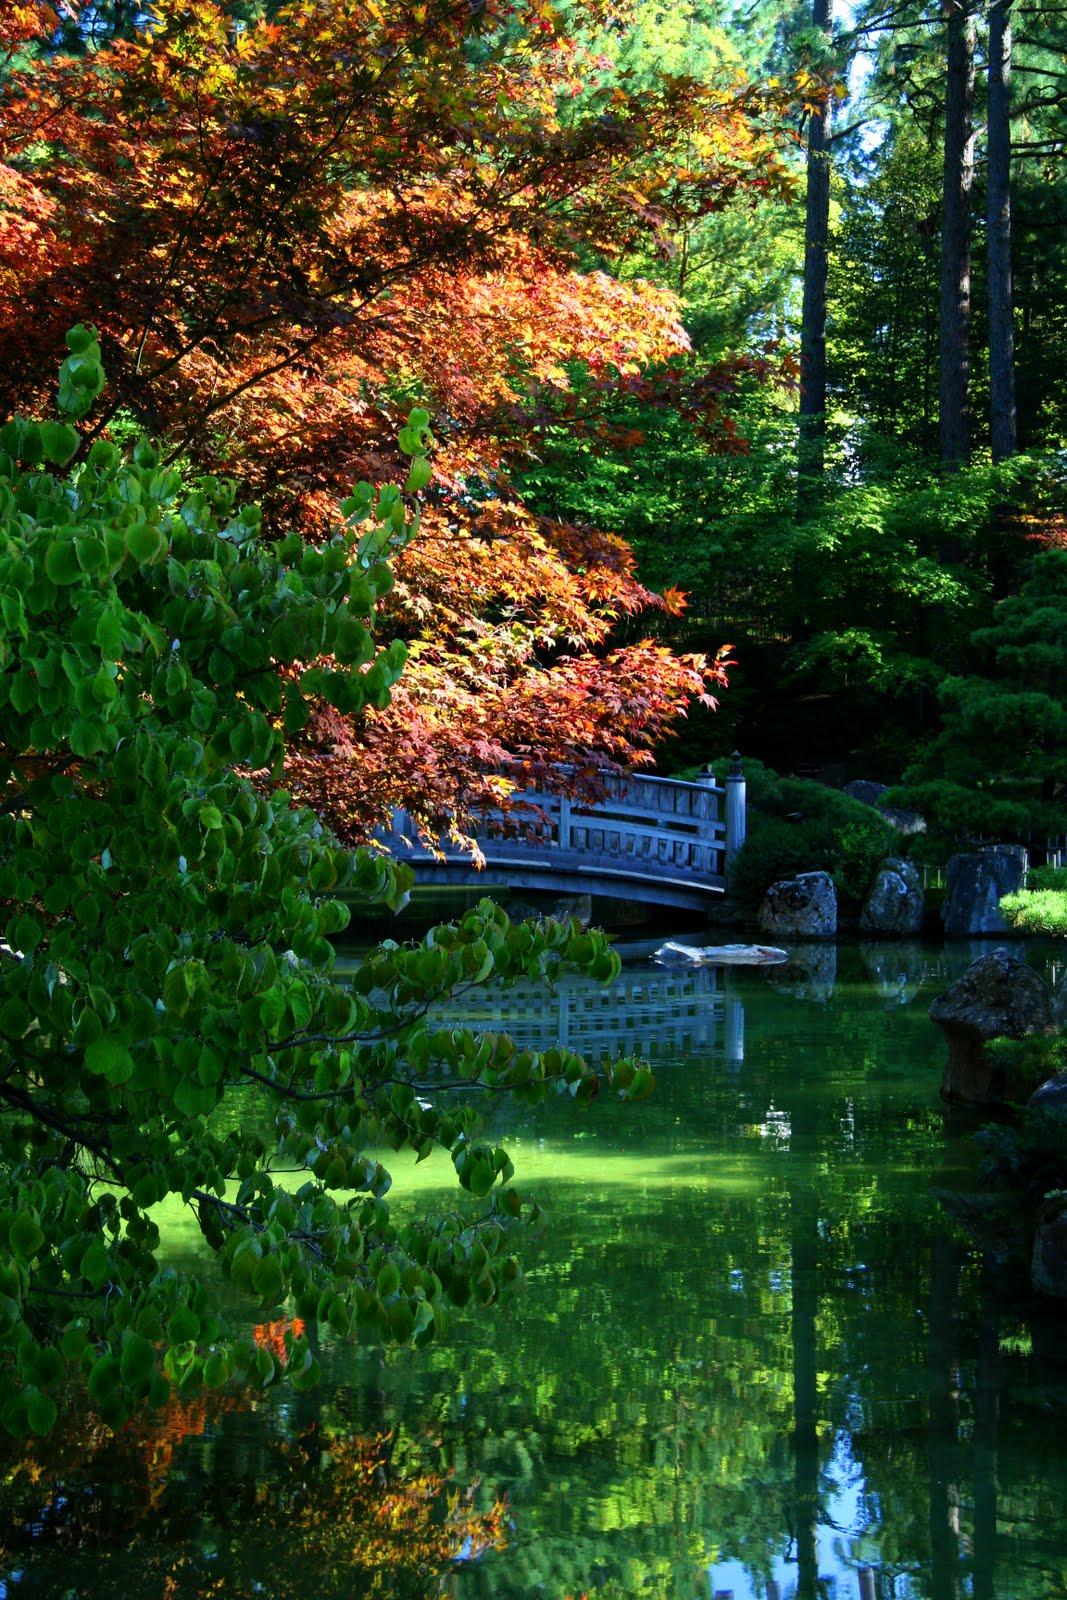 Serendipity and orchids manito city park for Nishinomiya tsutakawa japanese garden koi